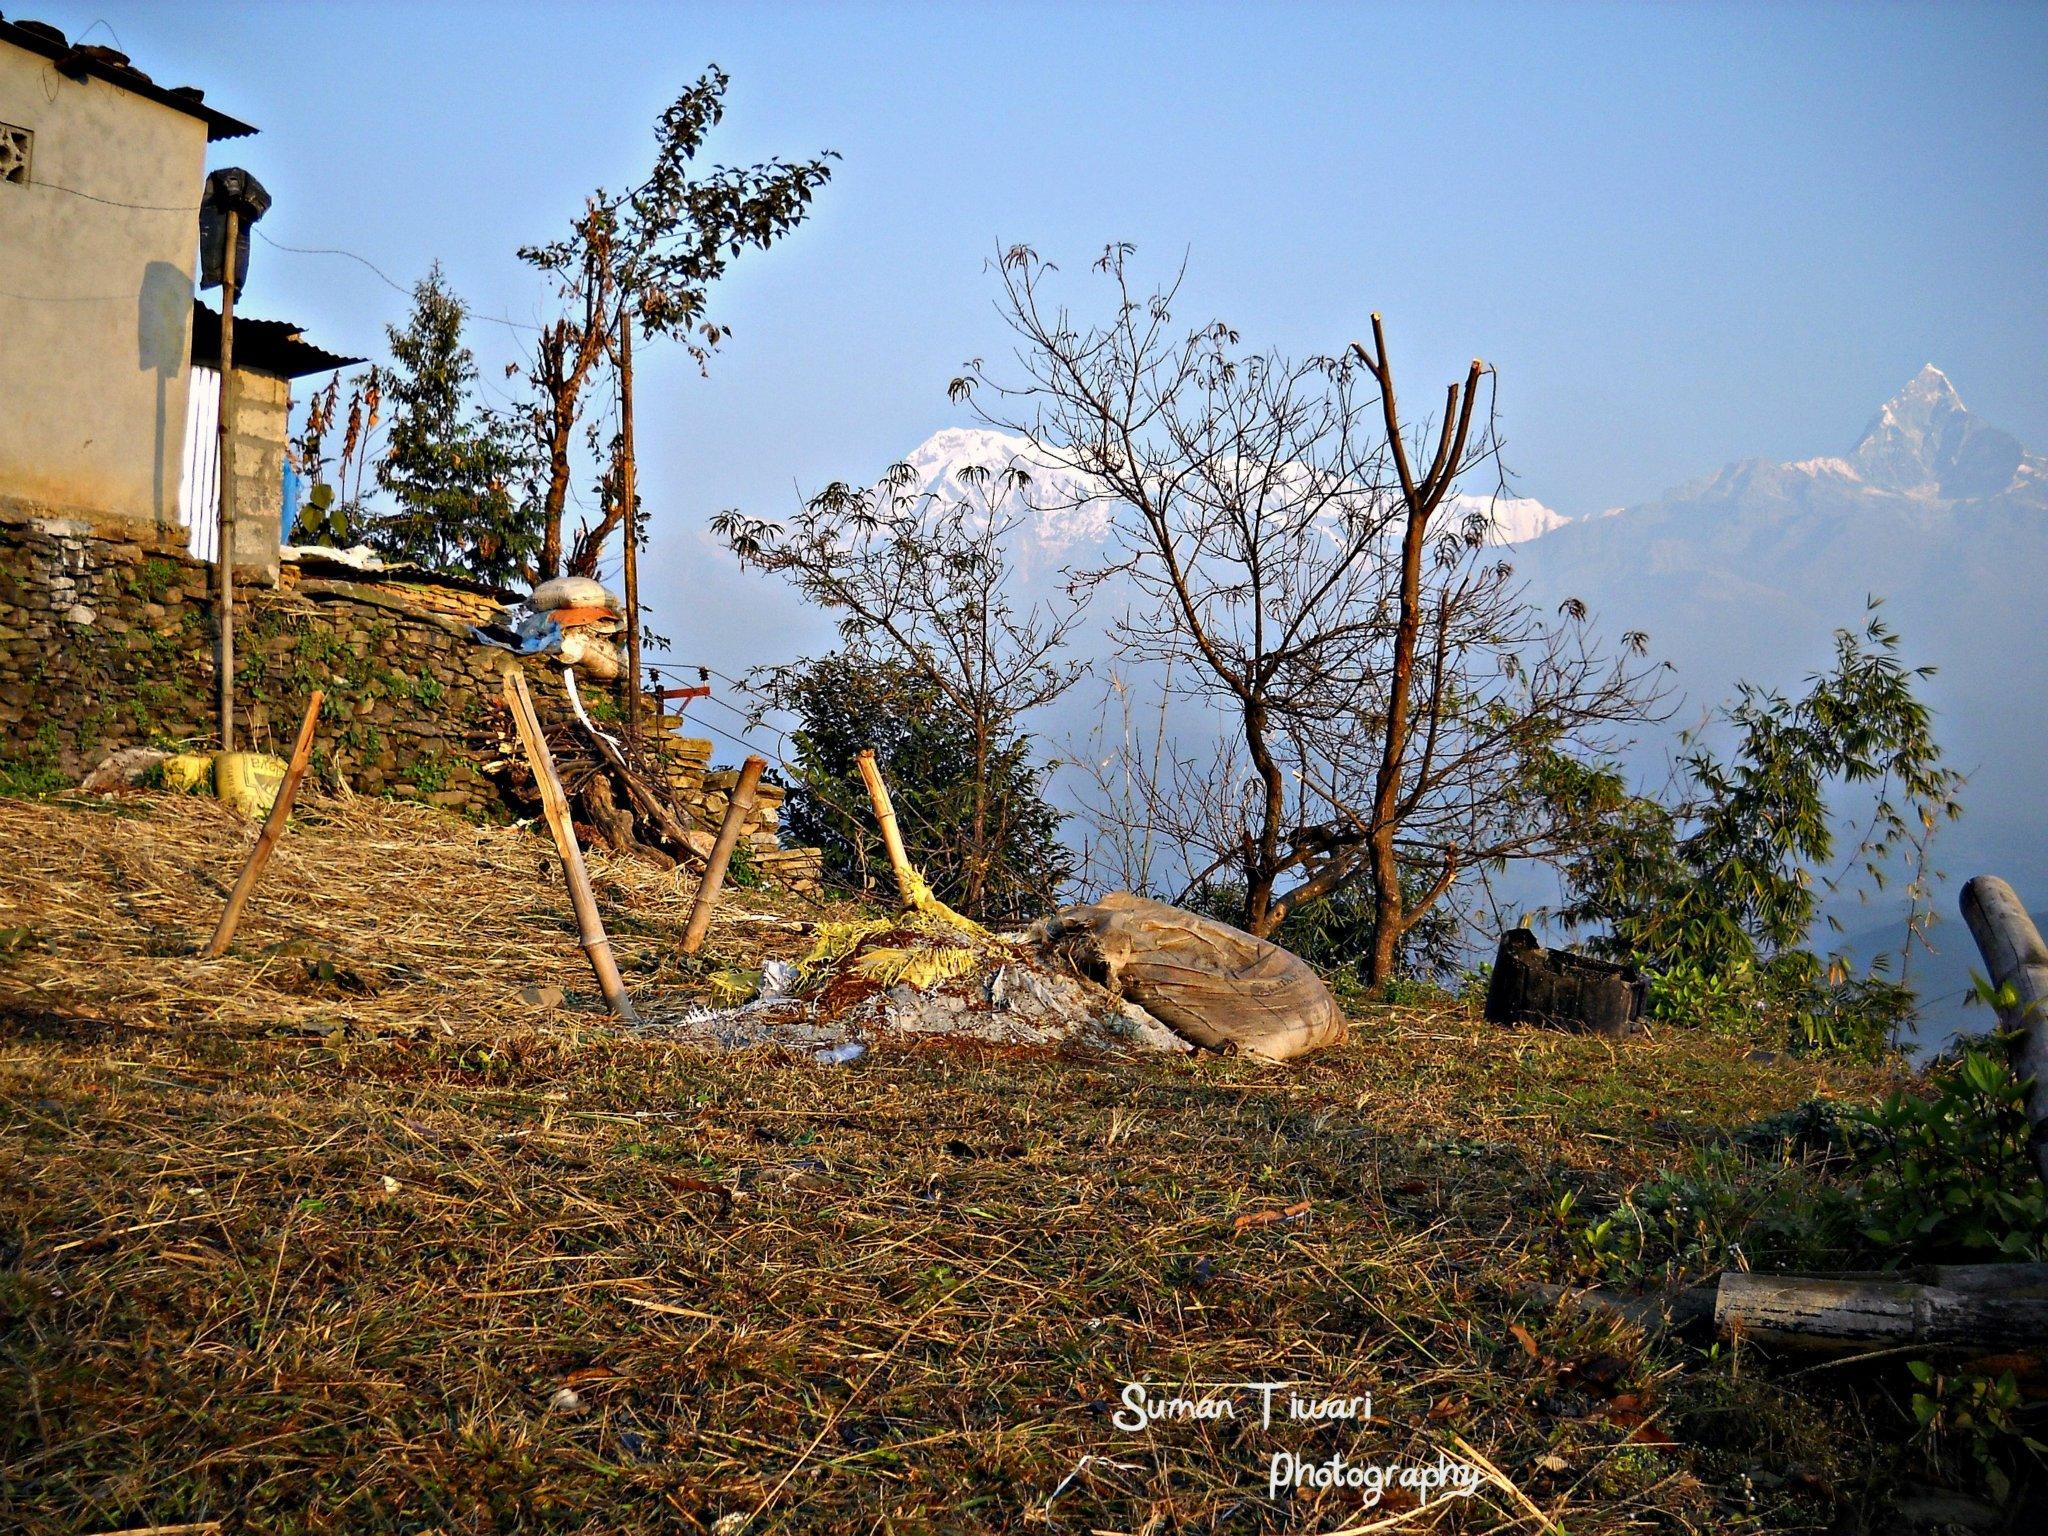 Landscape_Pokhara_Suman_Tiwari_Photography1